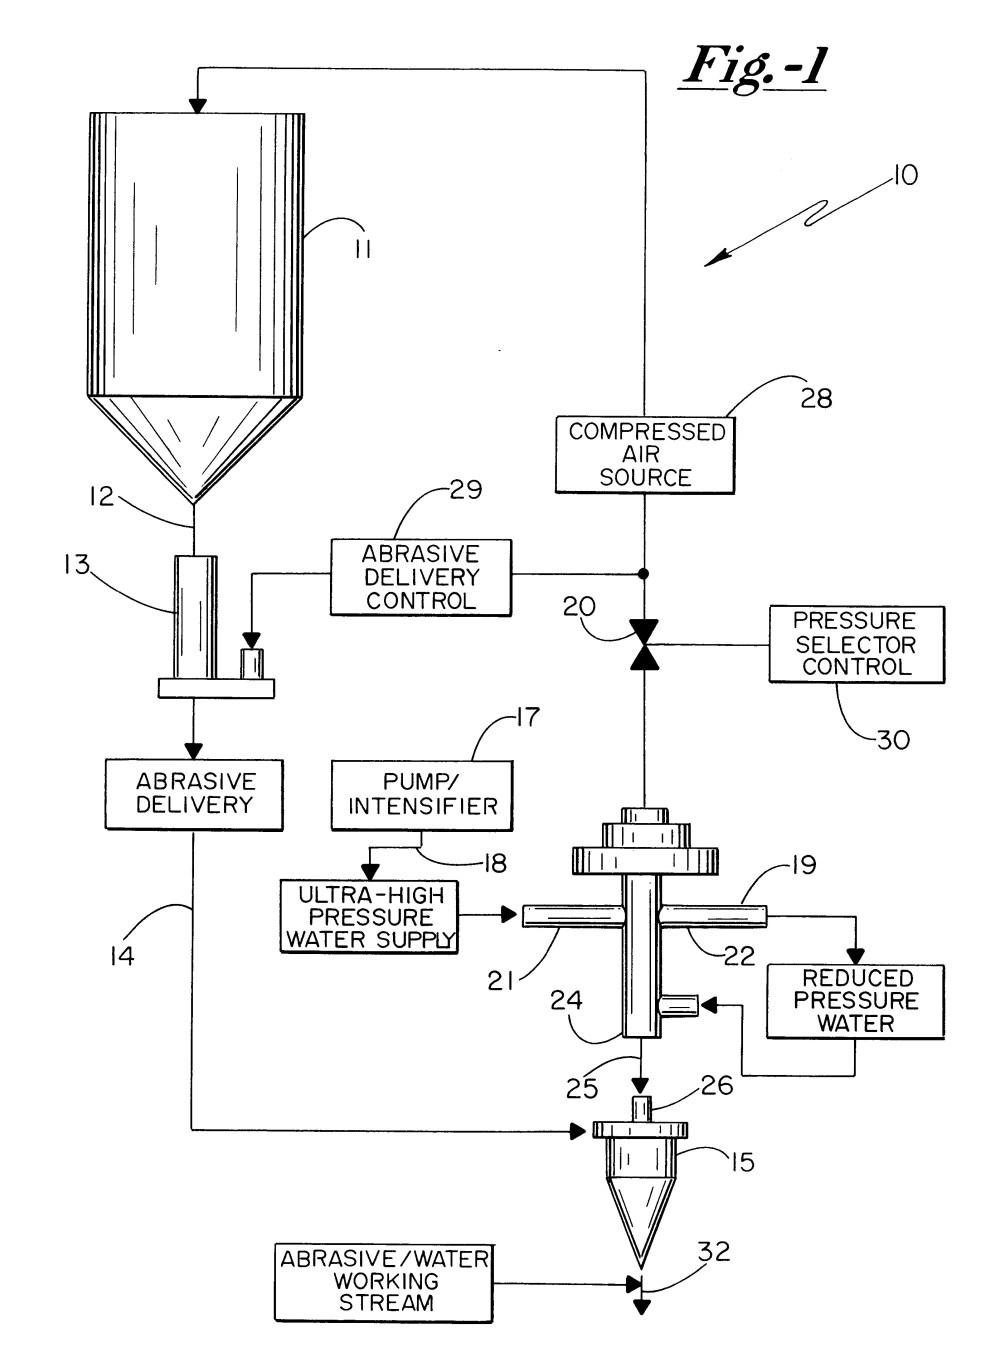 medium resolution of jet boat engine diagram water jet machining schematic diagram google search of jet boat engine diagram